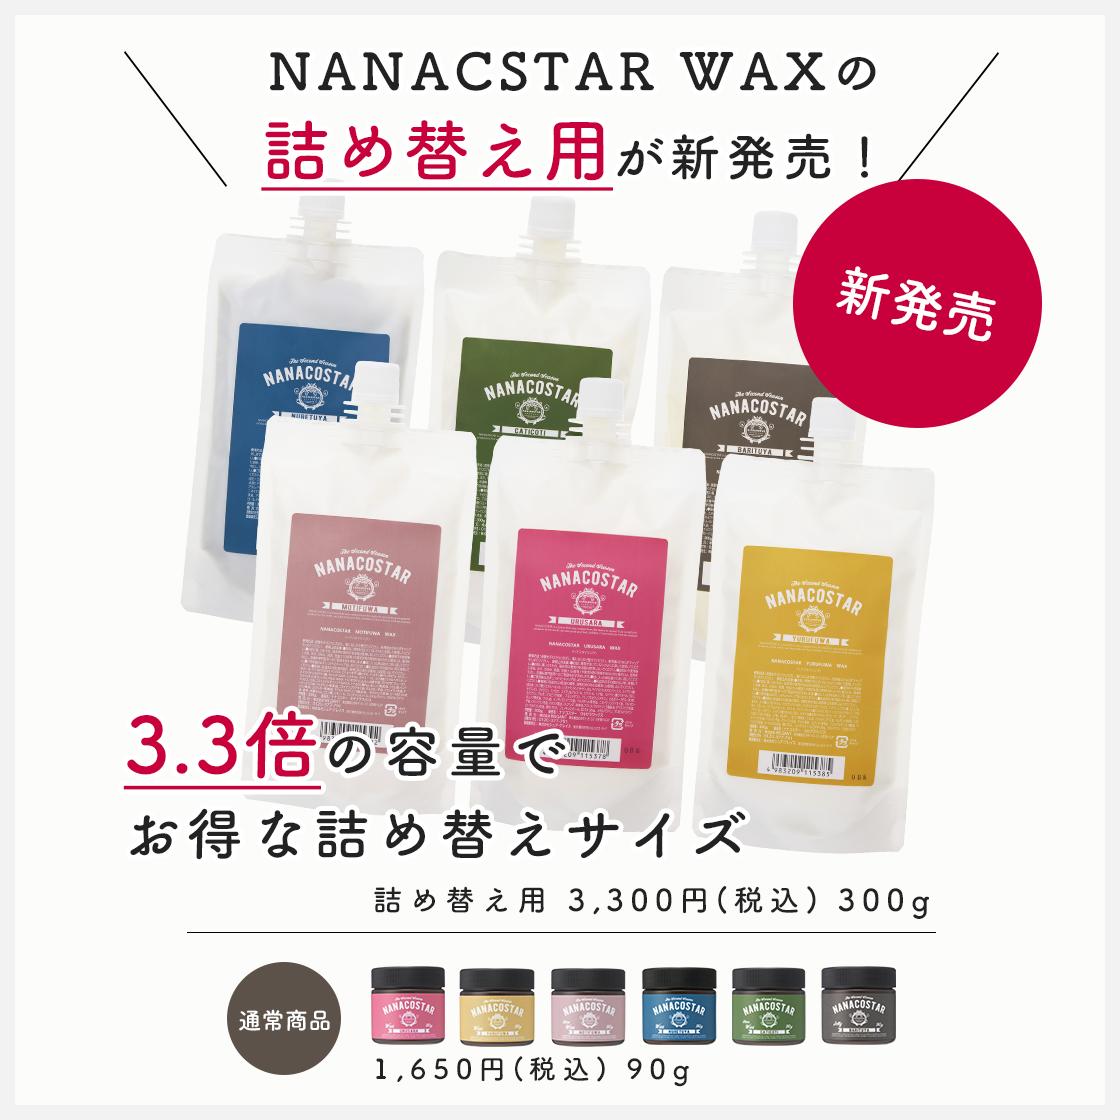 【 WAX 】詰め替え用 300g